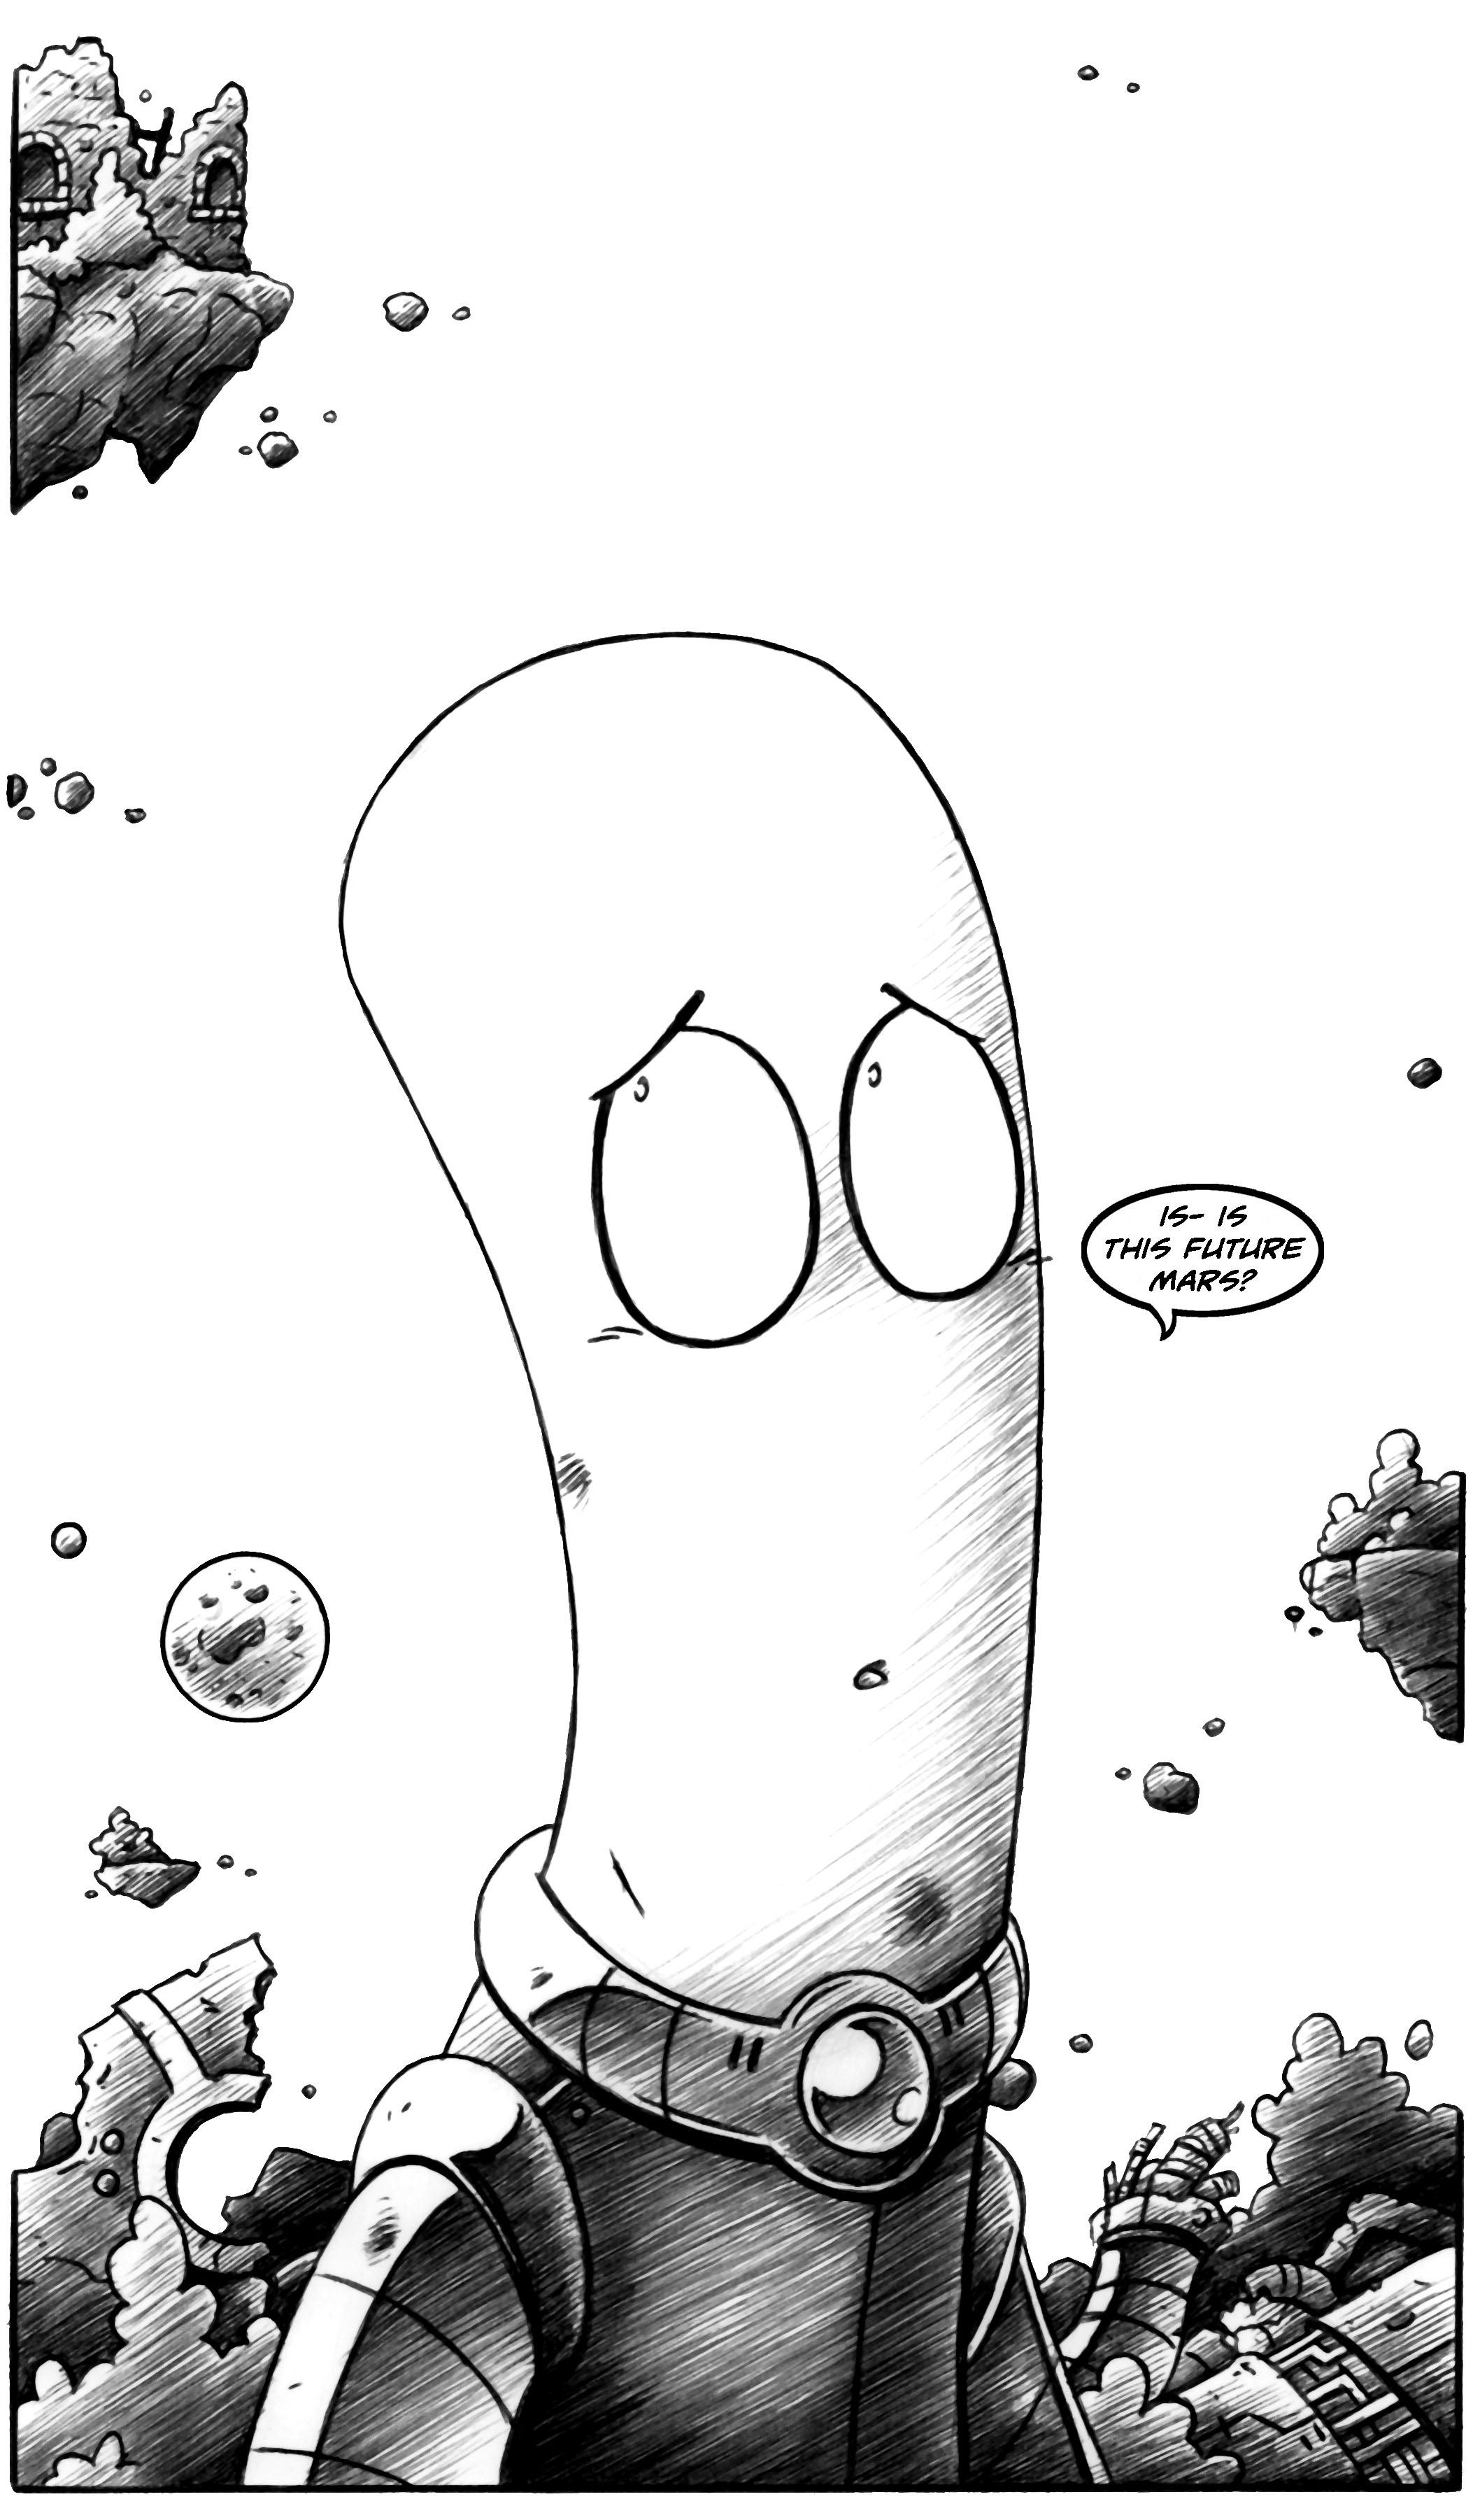 Wayfarer Invasion: Chapter 4, Page 51